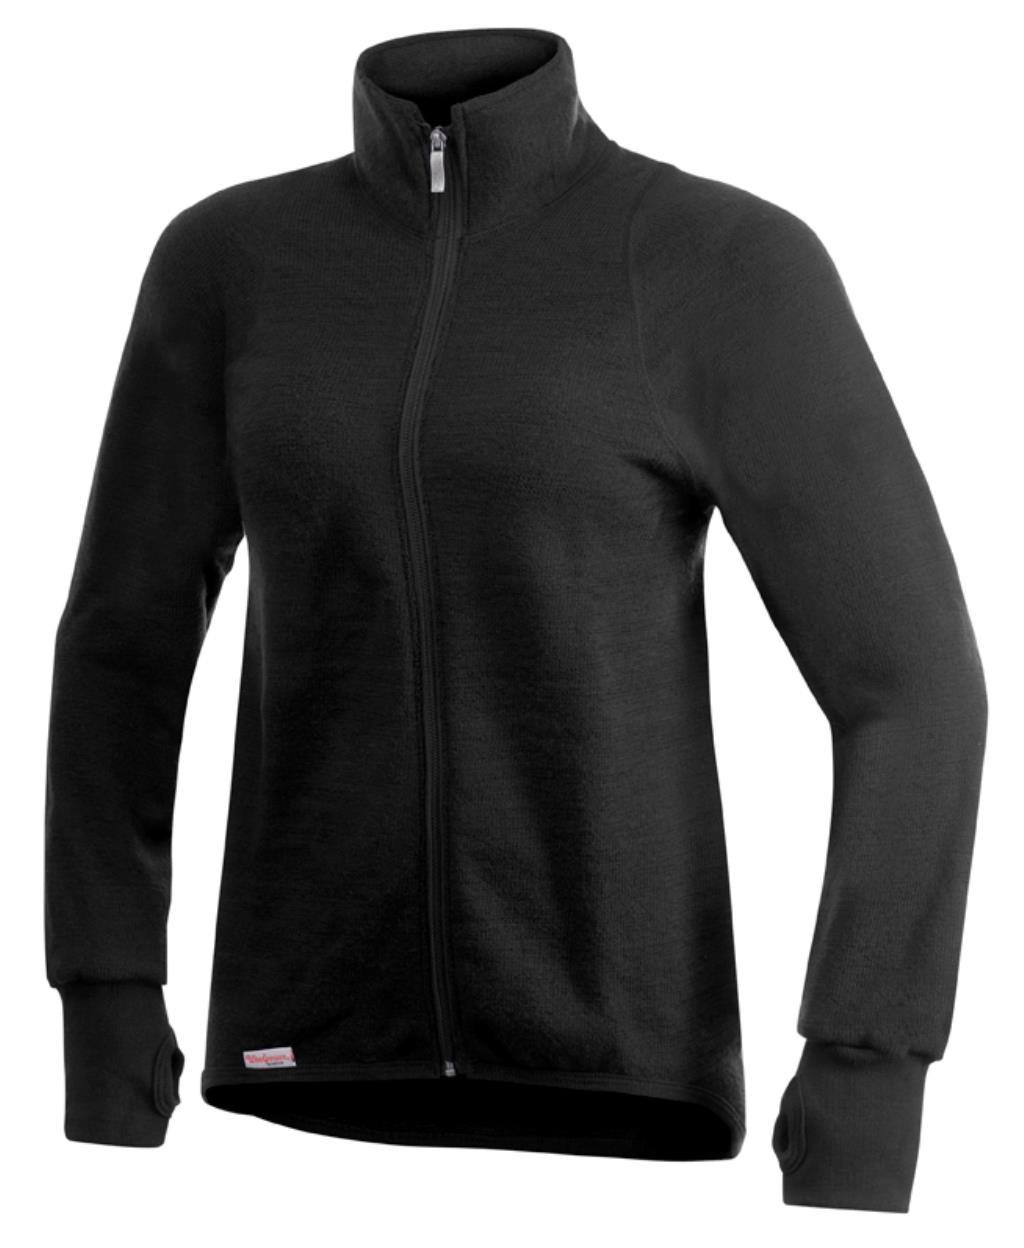 Full Zip Jacket, Unisex, 400 g